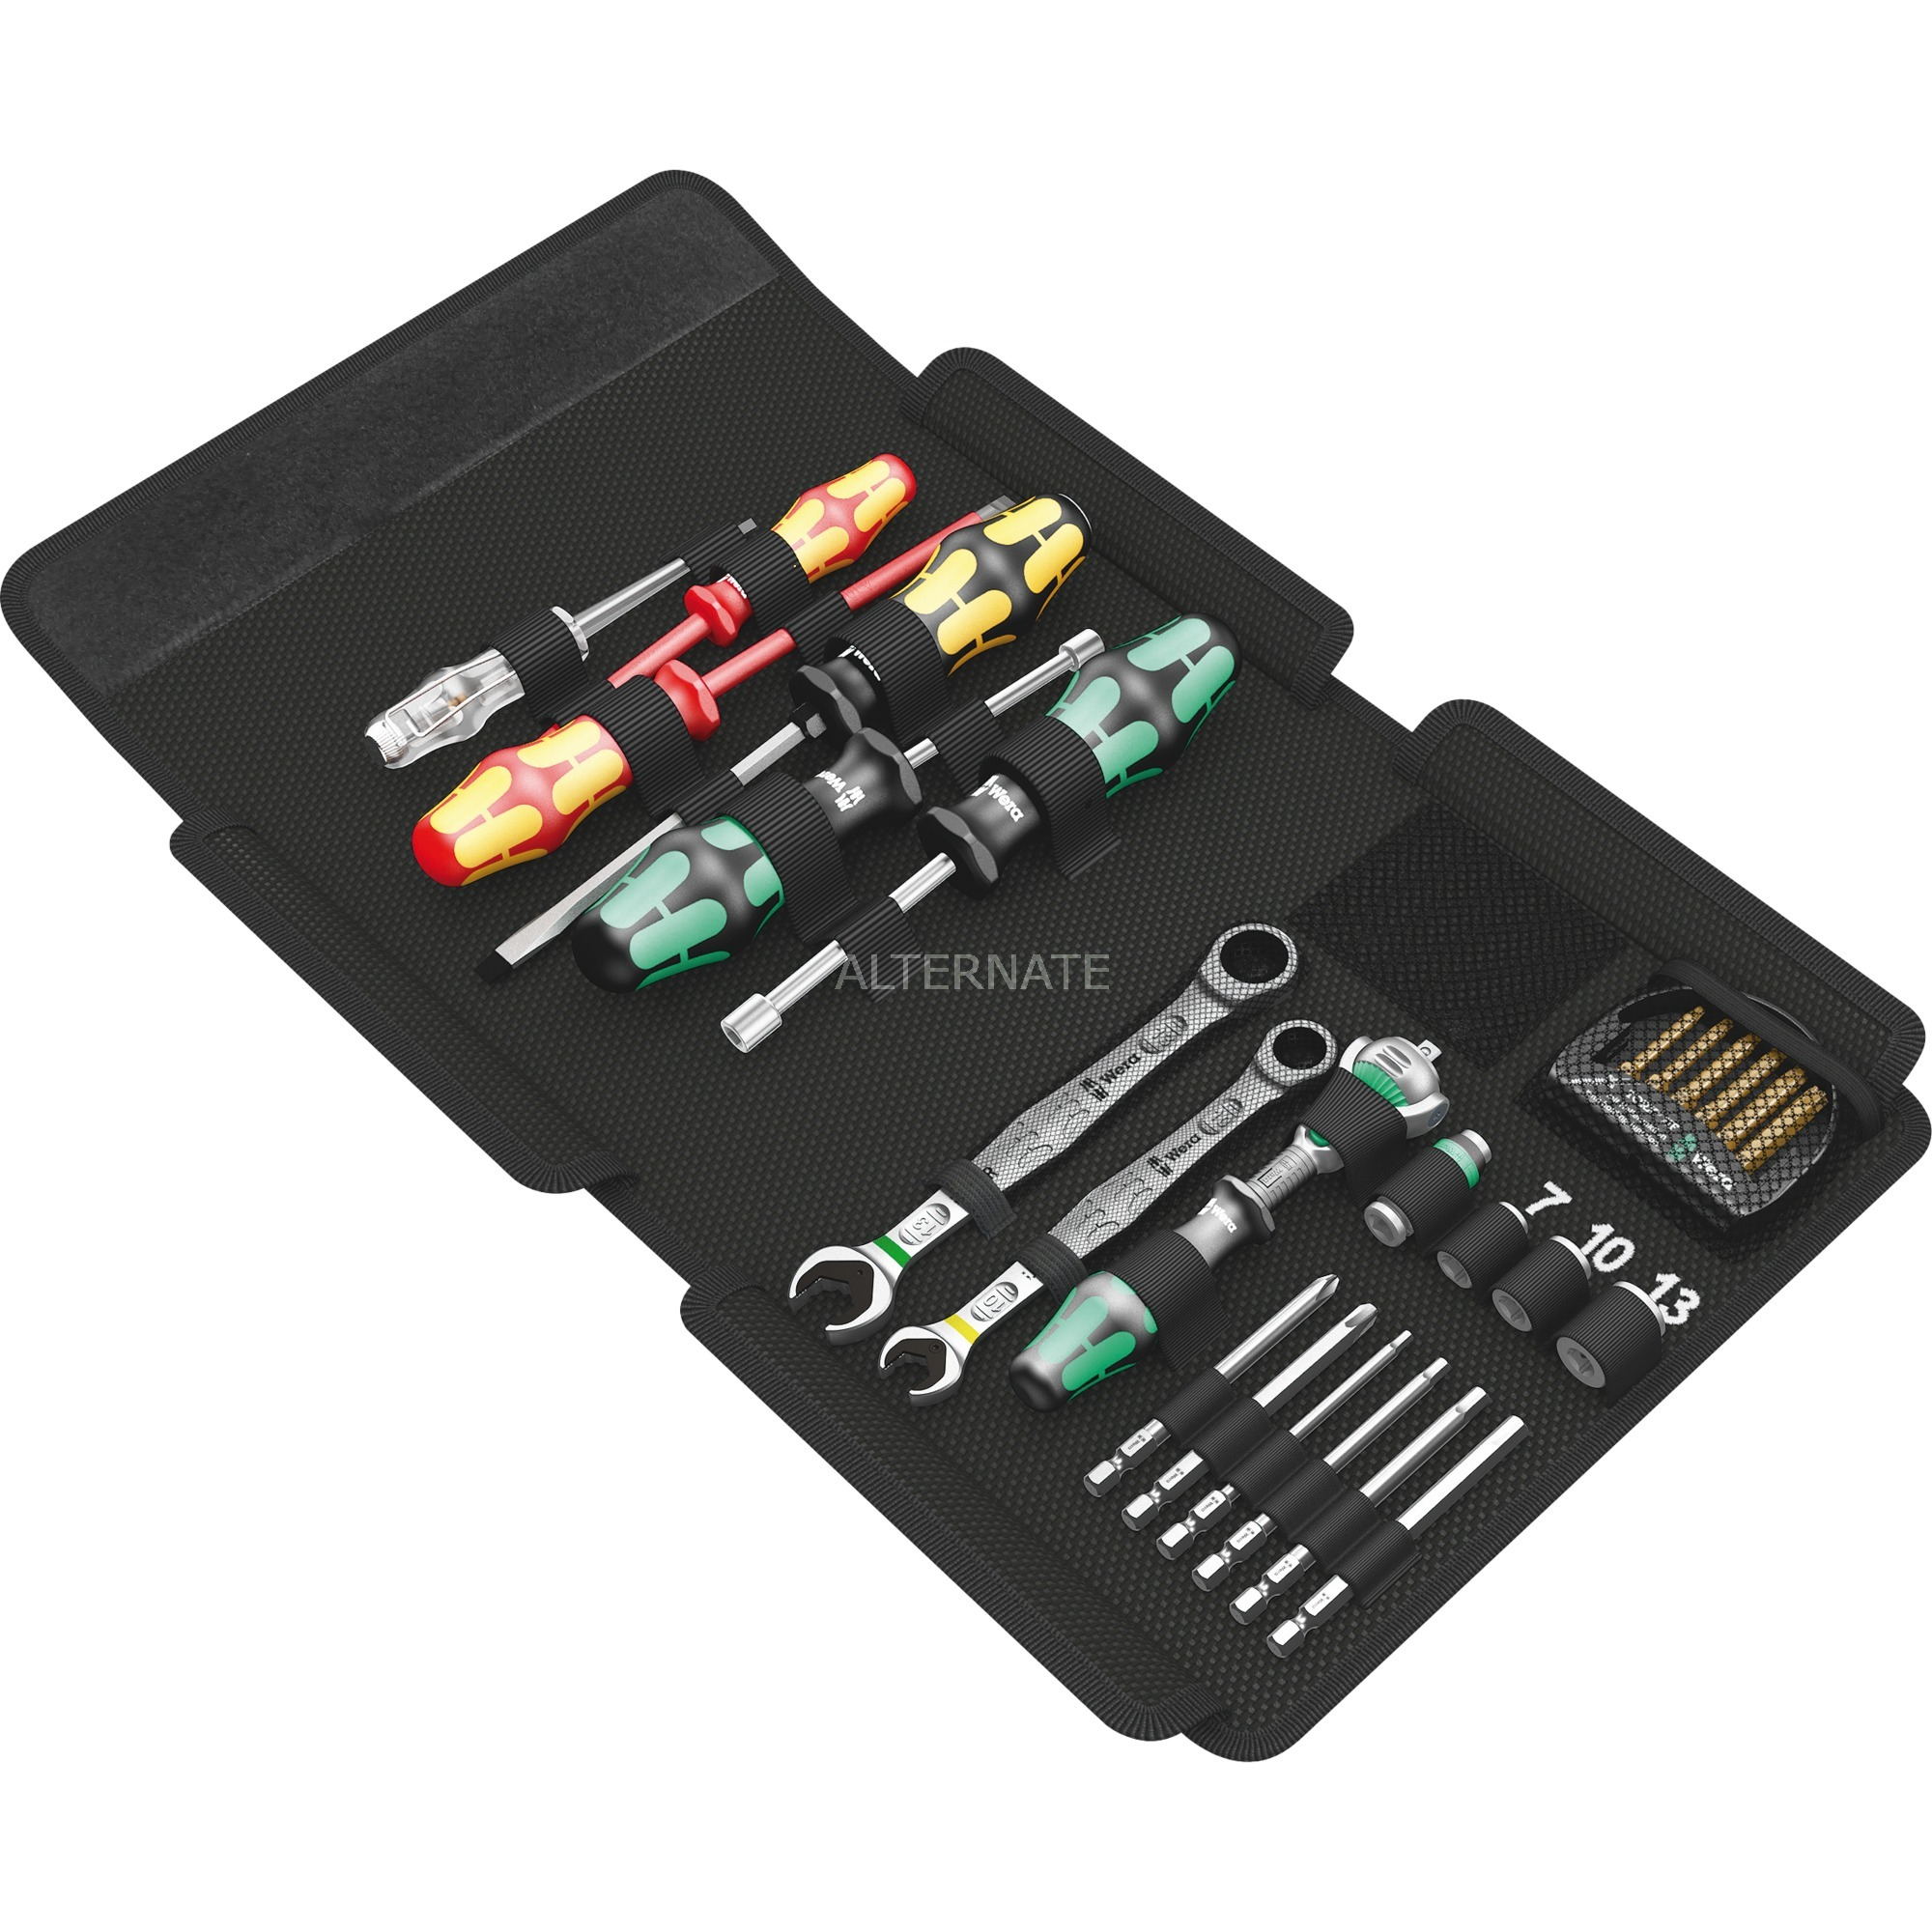 05135927001, Kit de herramientas